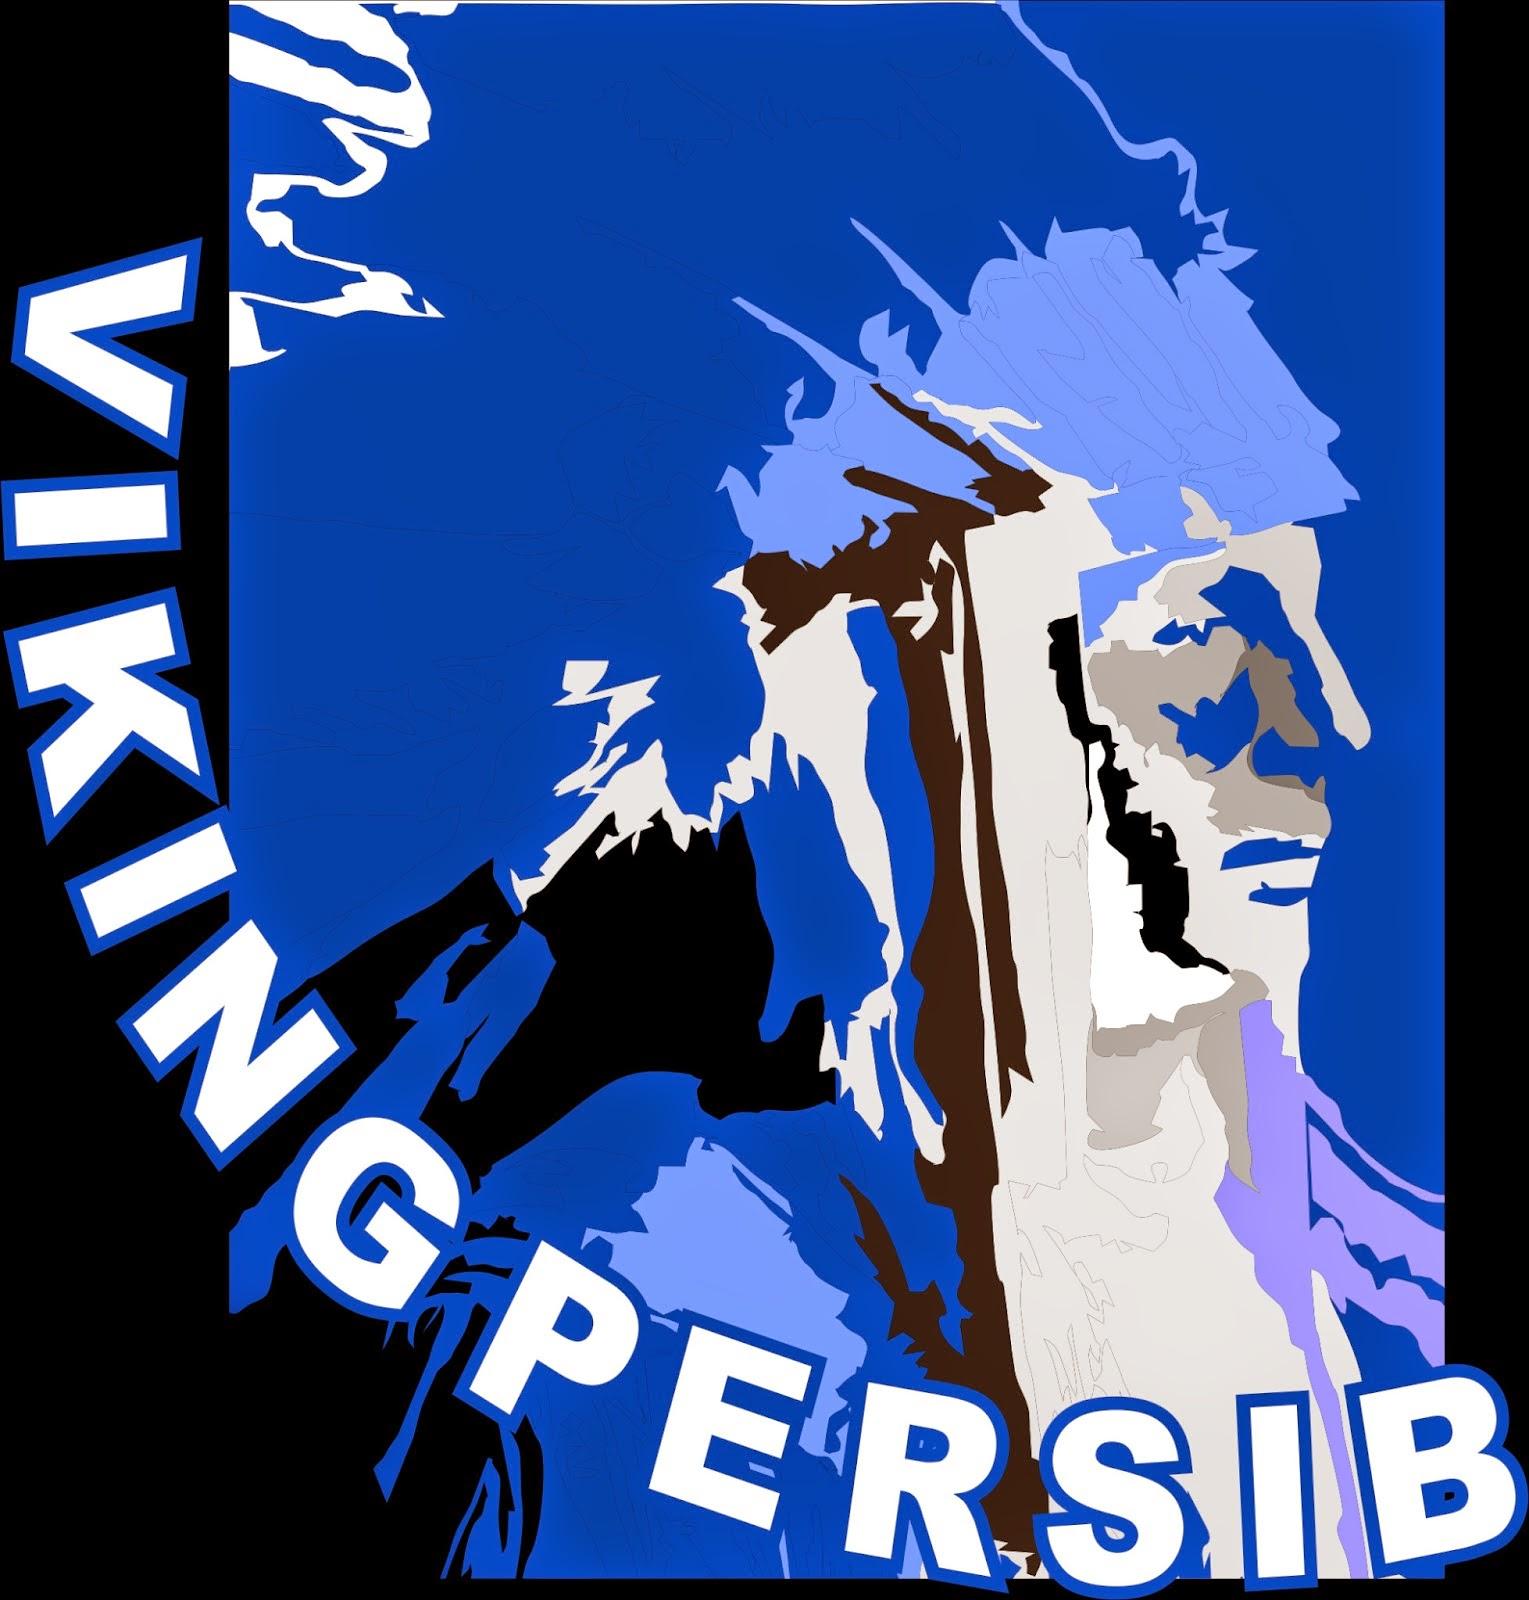 Kumpulan Foto Wallpaper Logo Viking Persib